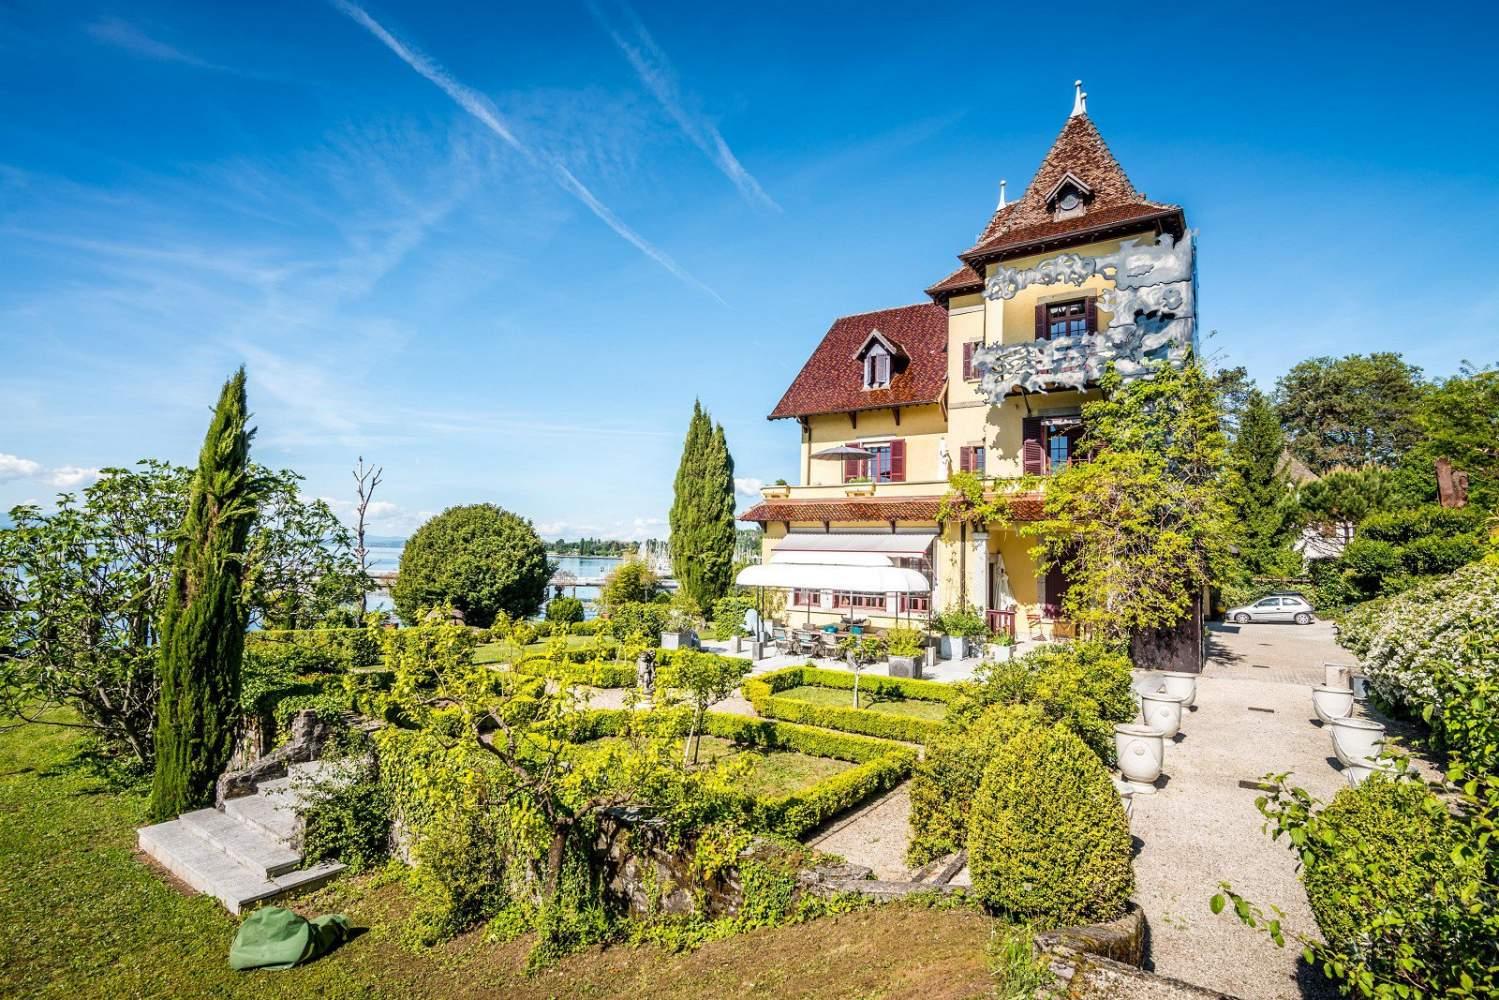 Thonon-les-Bains  - Casa 16 Cuartos 10 Habitaciones - picture 1